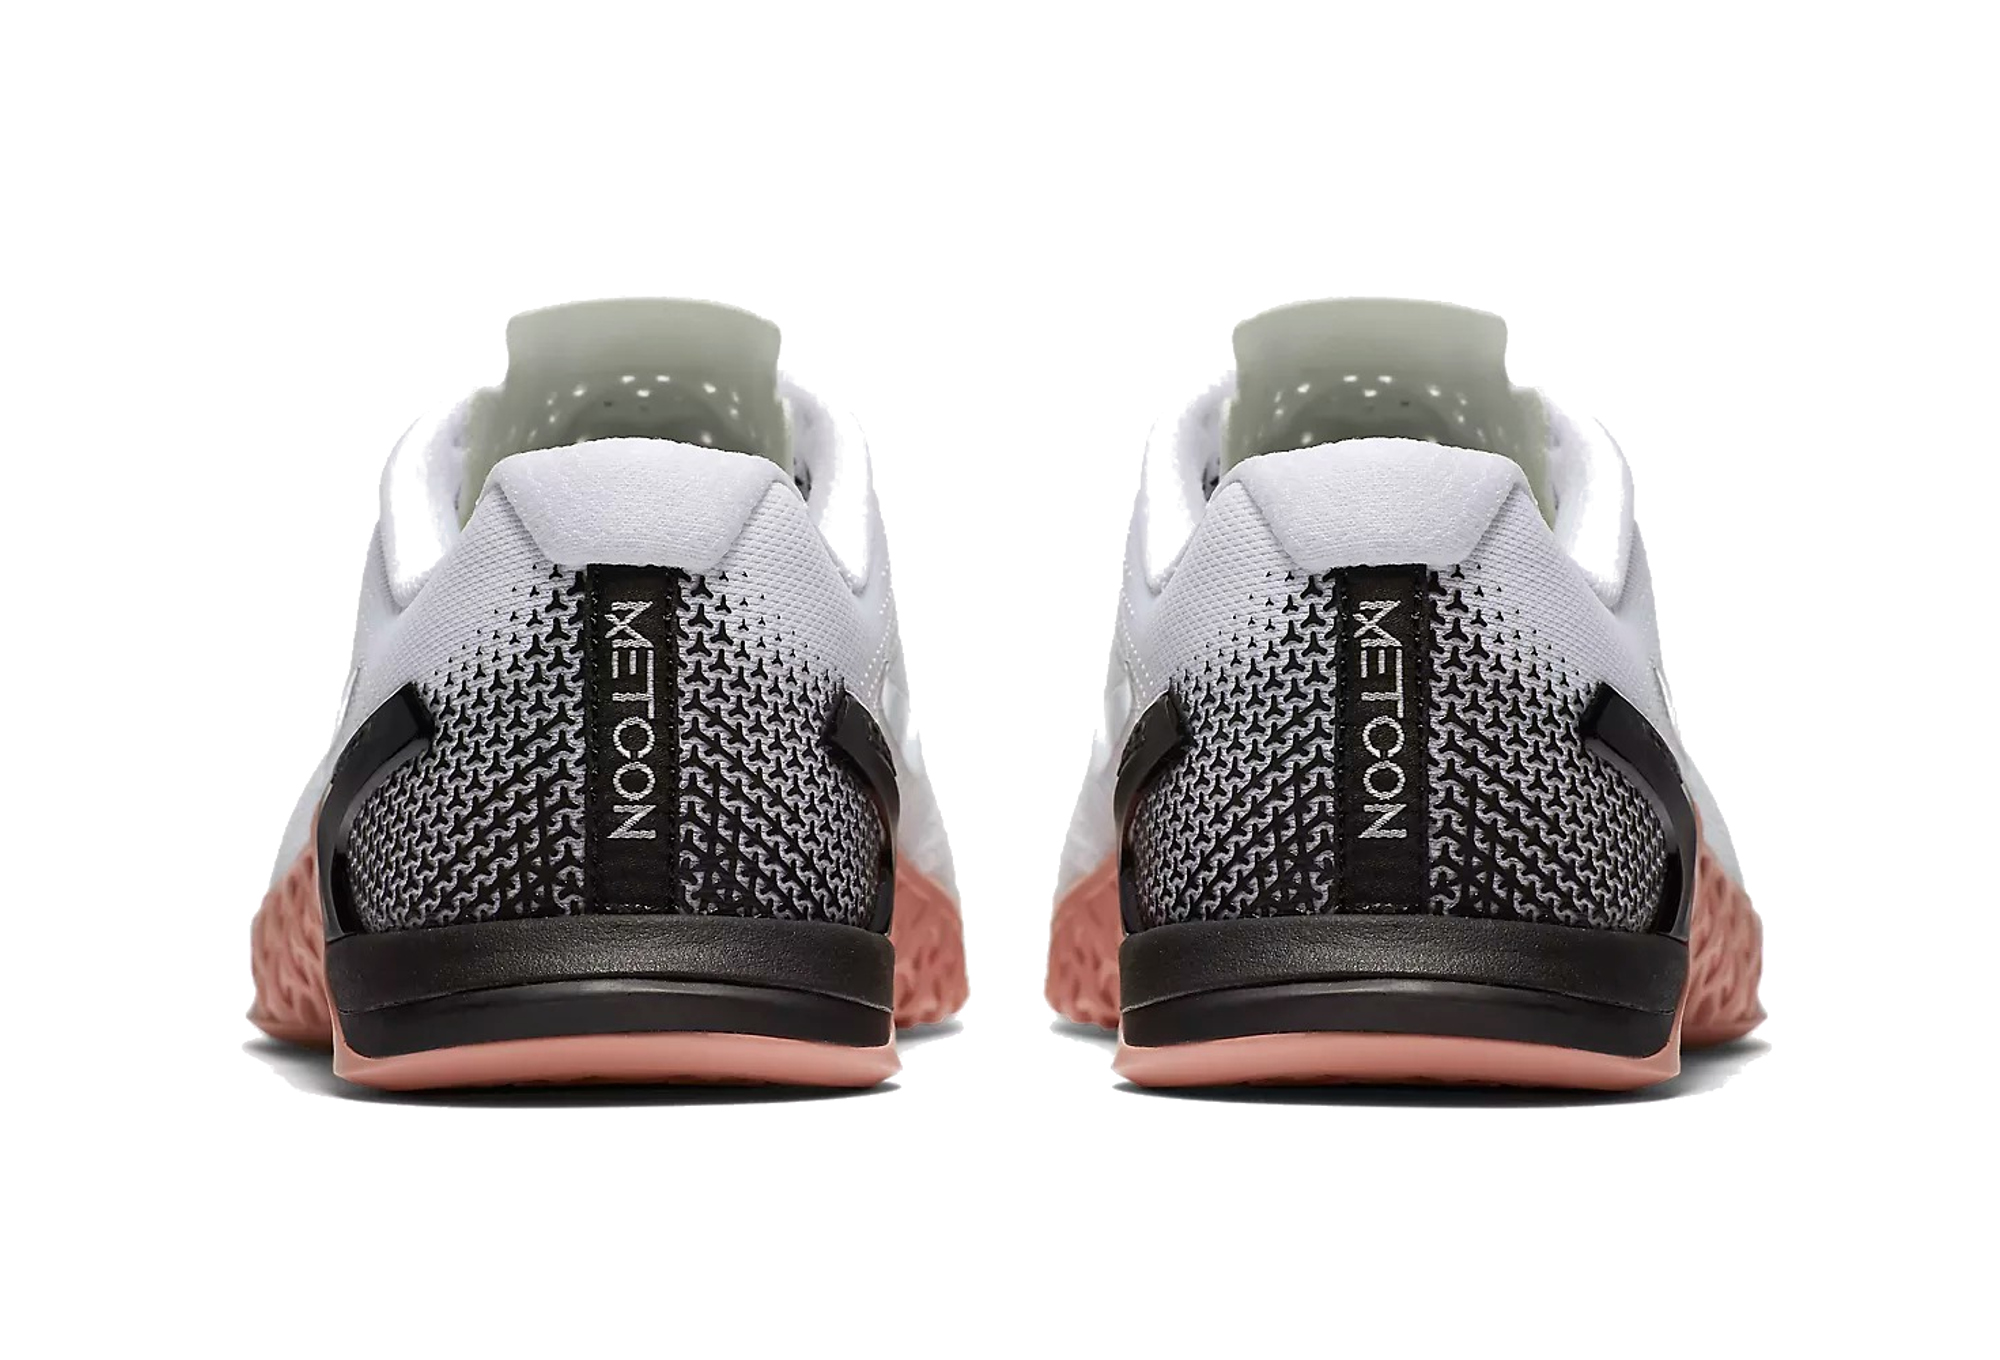 Chaussures de Cross Training Femme Nike Metcon 4 Blanc | Alltricks.fr